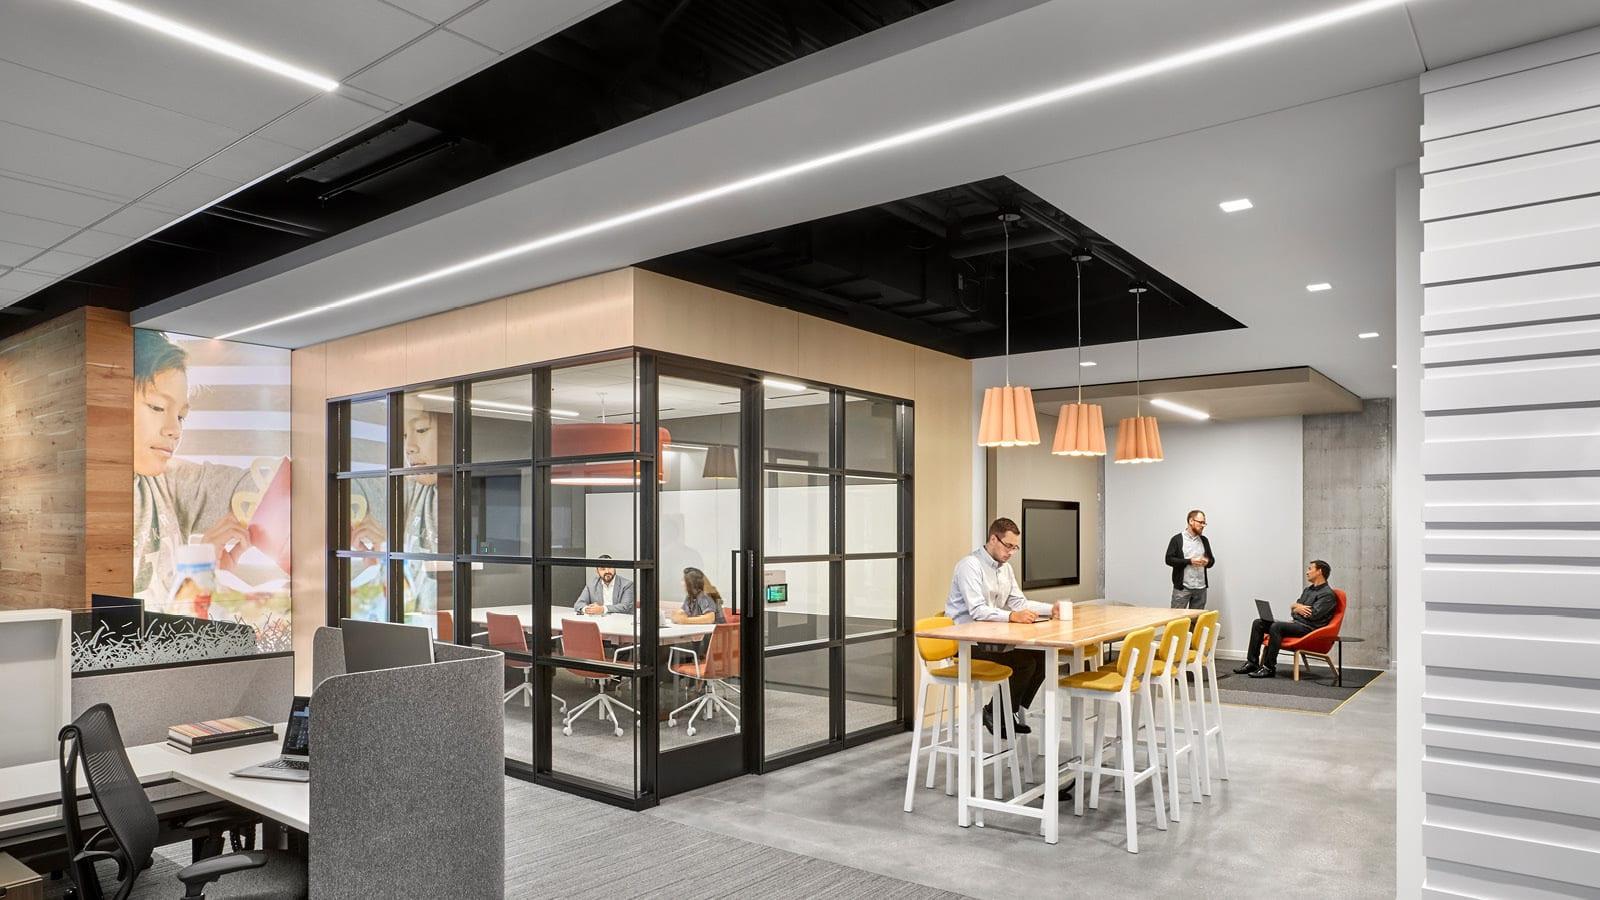 McDonalds Headquarters, Chicago, IL. Photo © Garrett Rowland